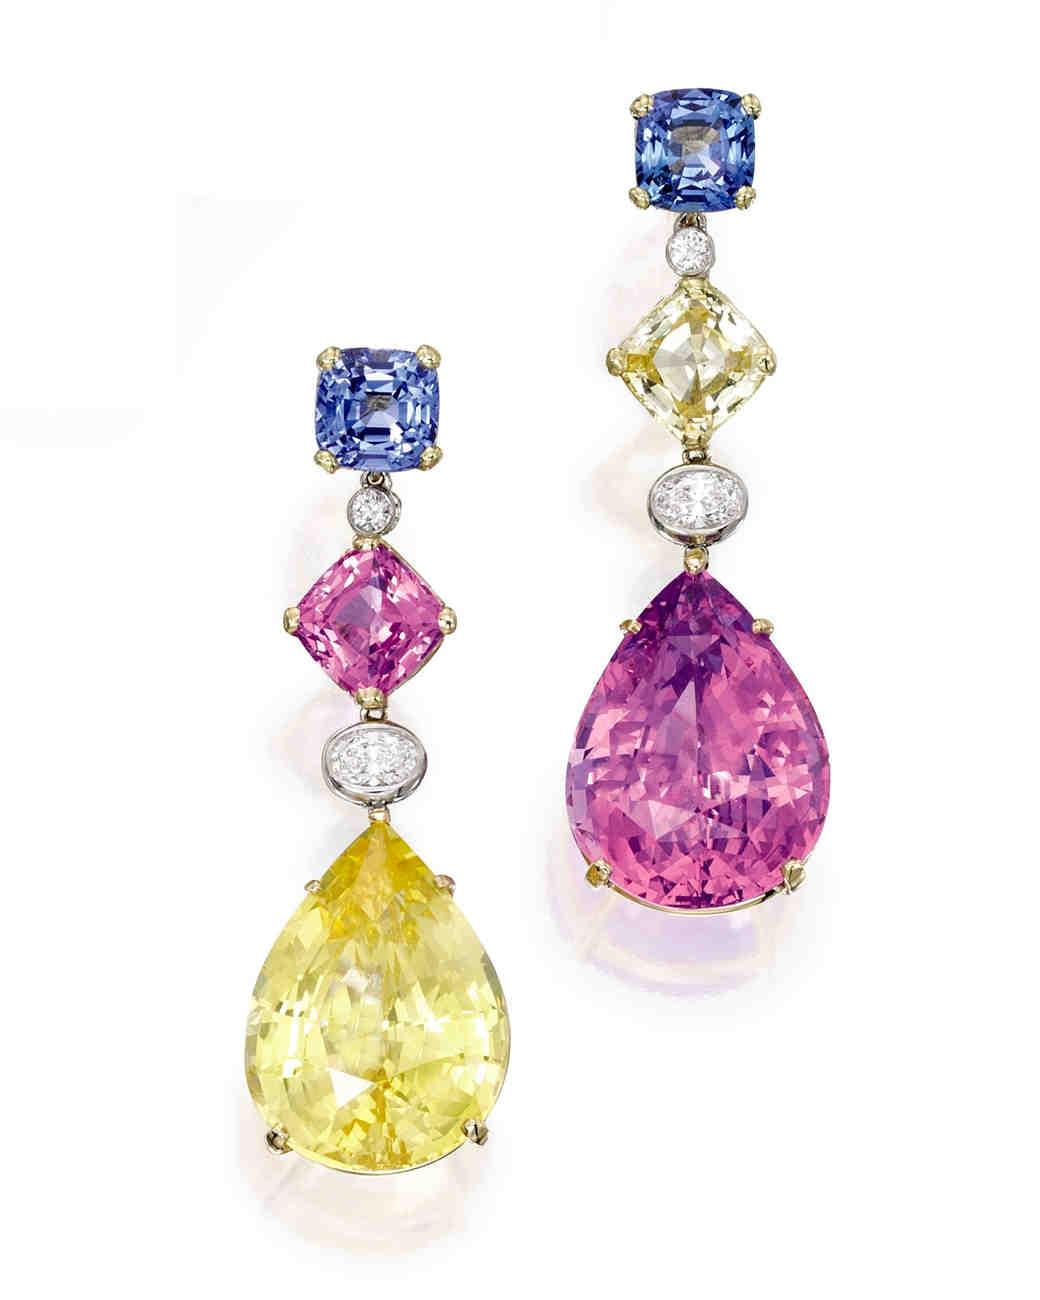 sothebys-ebay-auction-9331-lot-145-0415.jpg